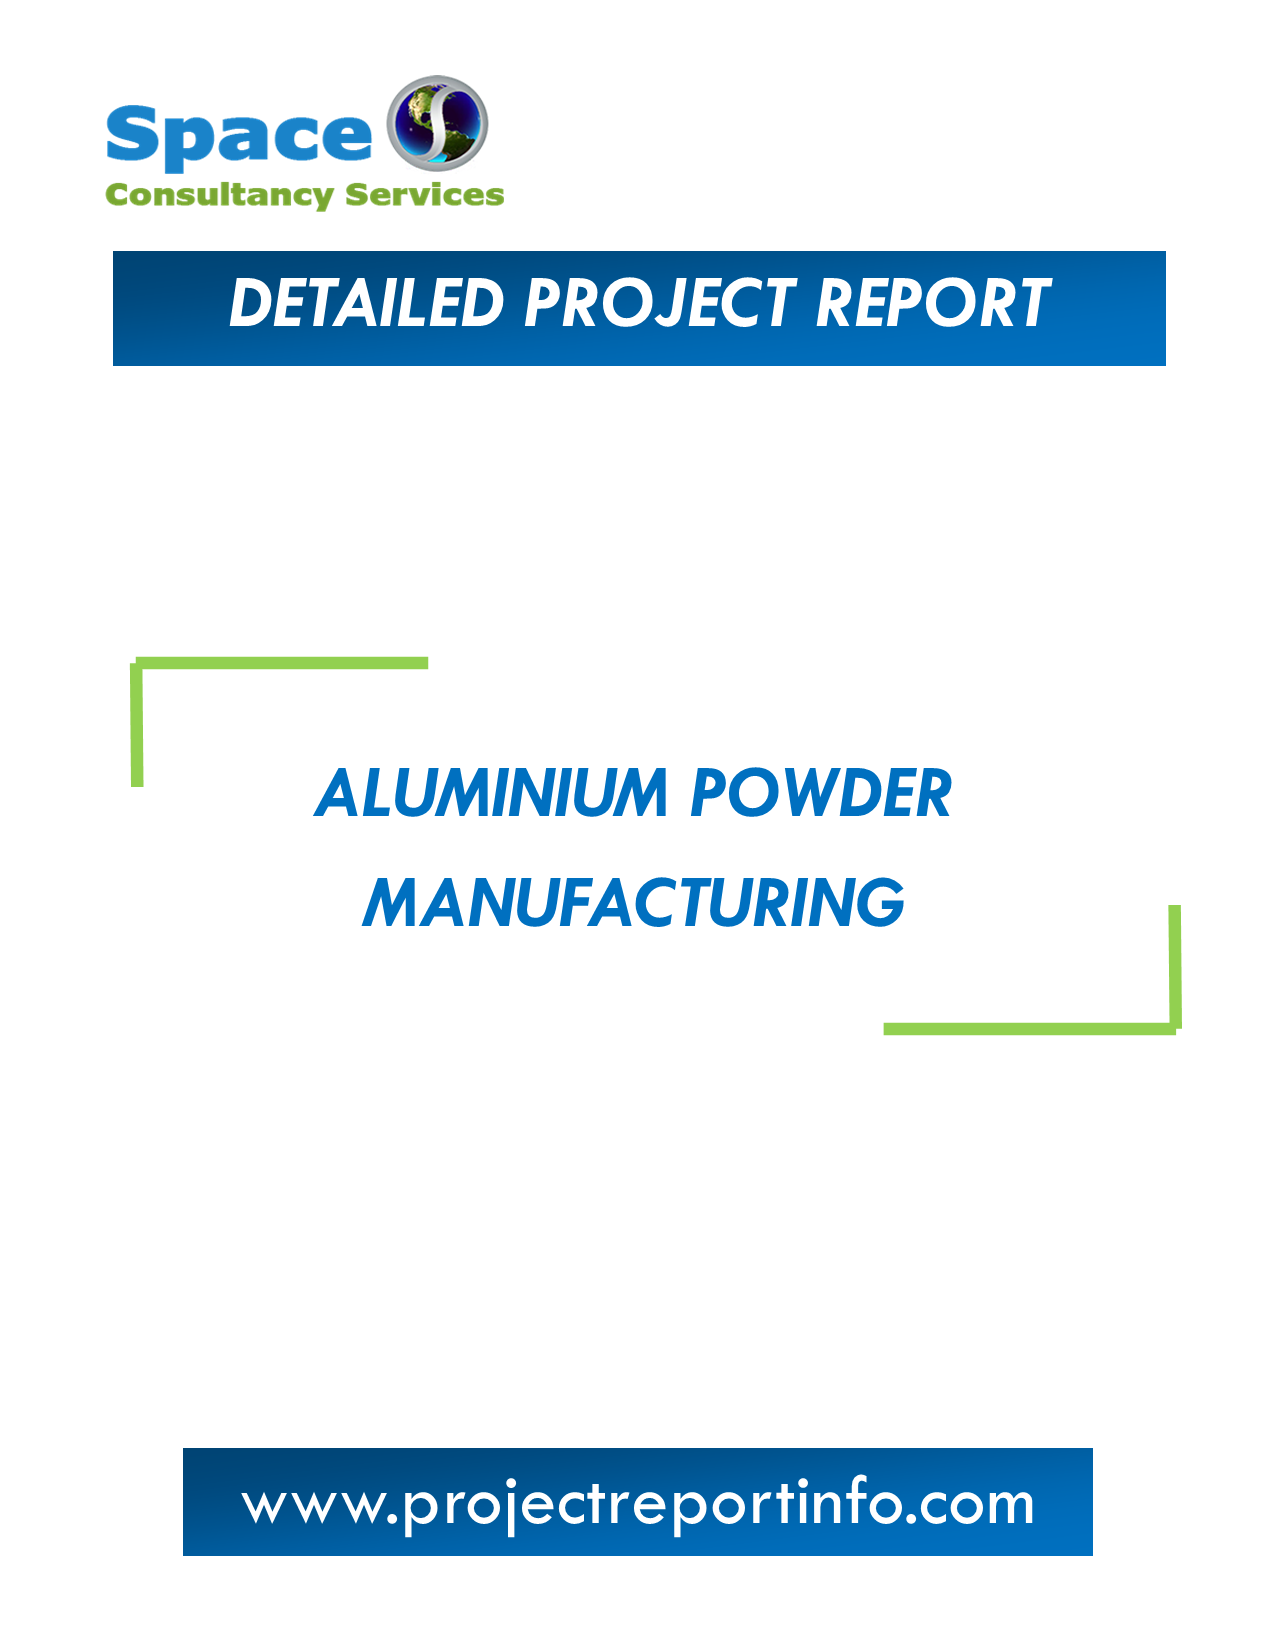 Project Report on Aluminium Powder Manufacturing